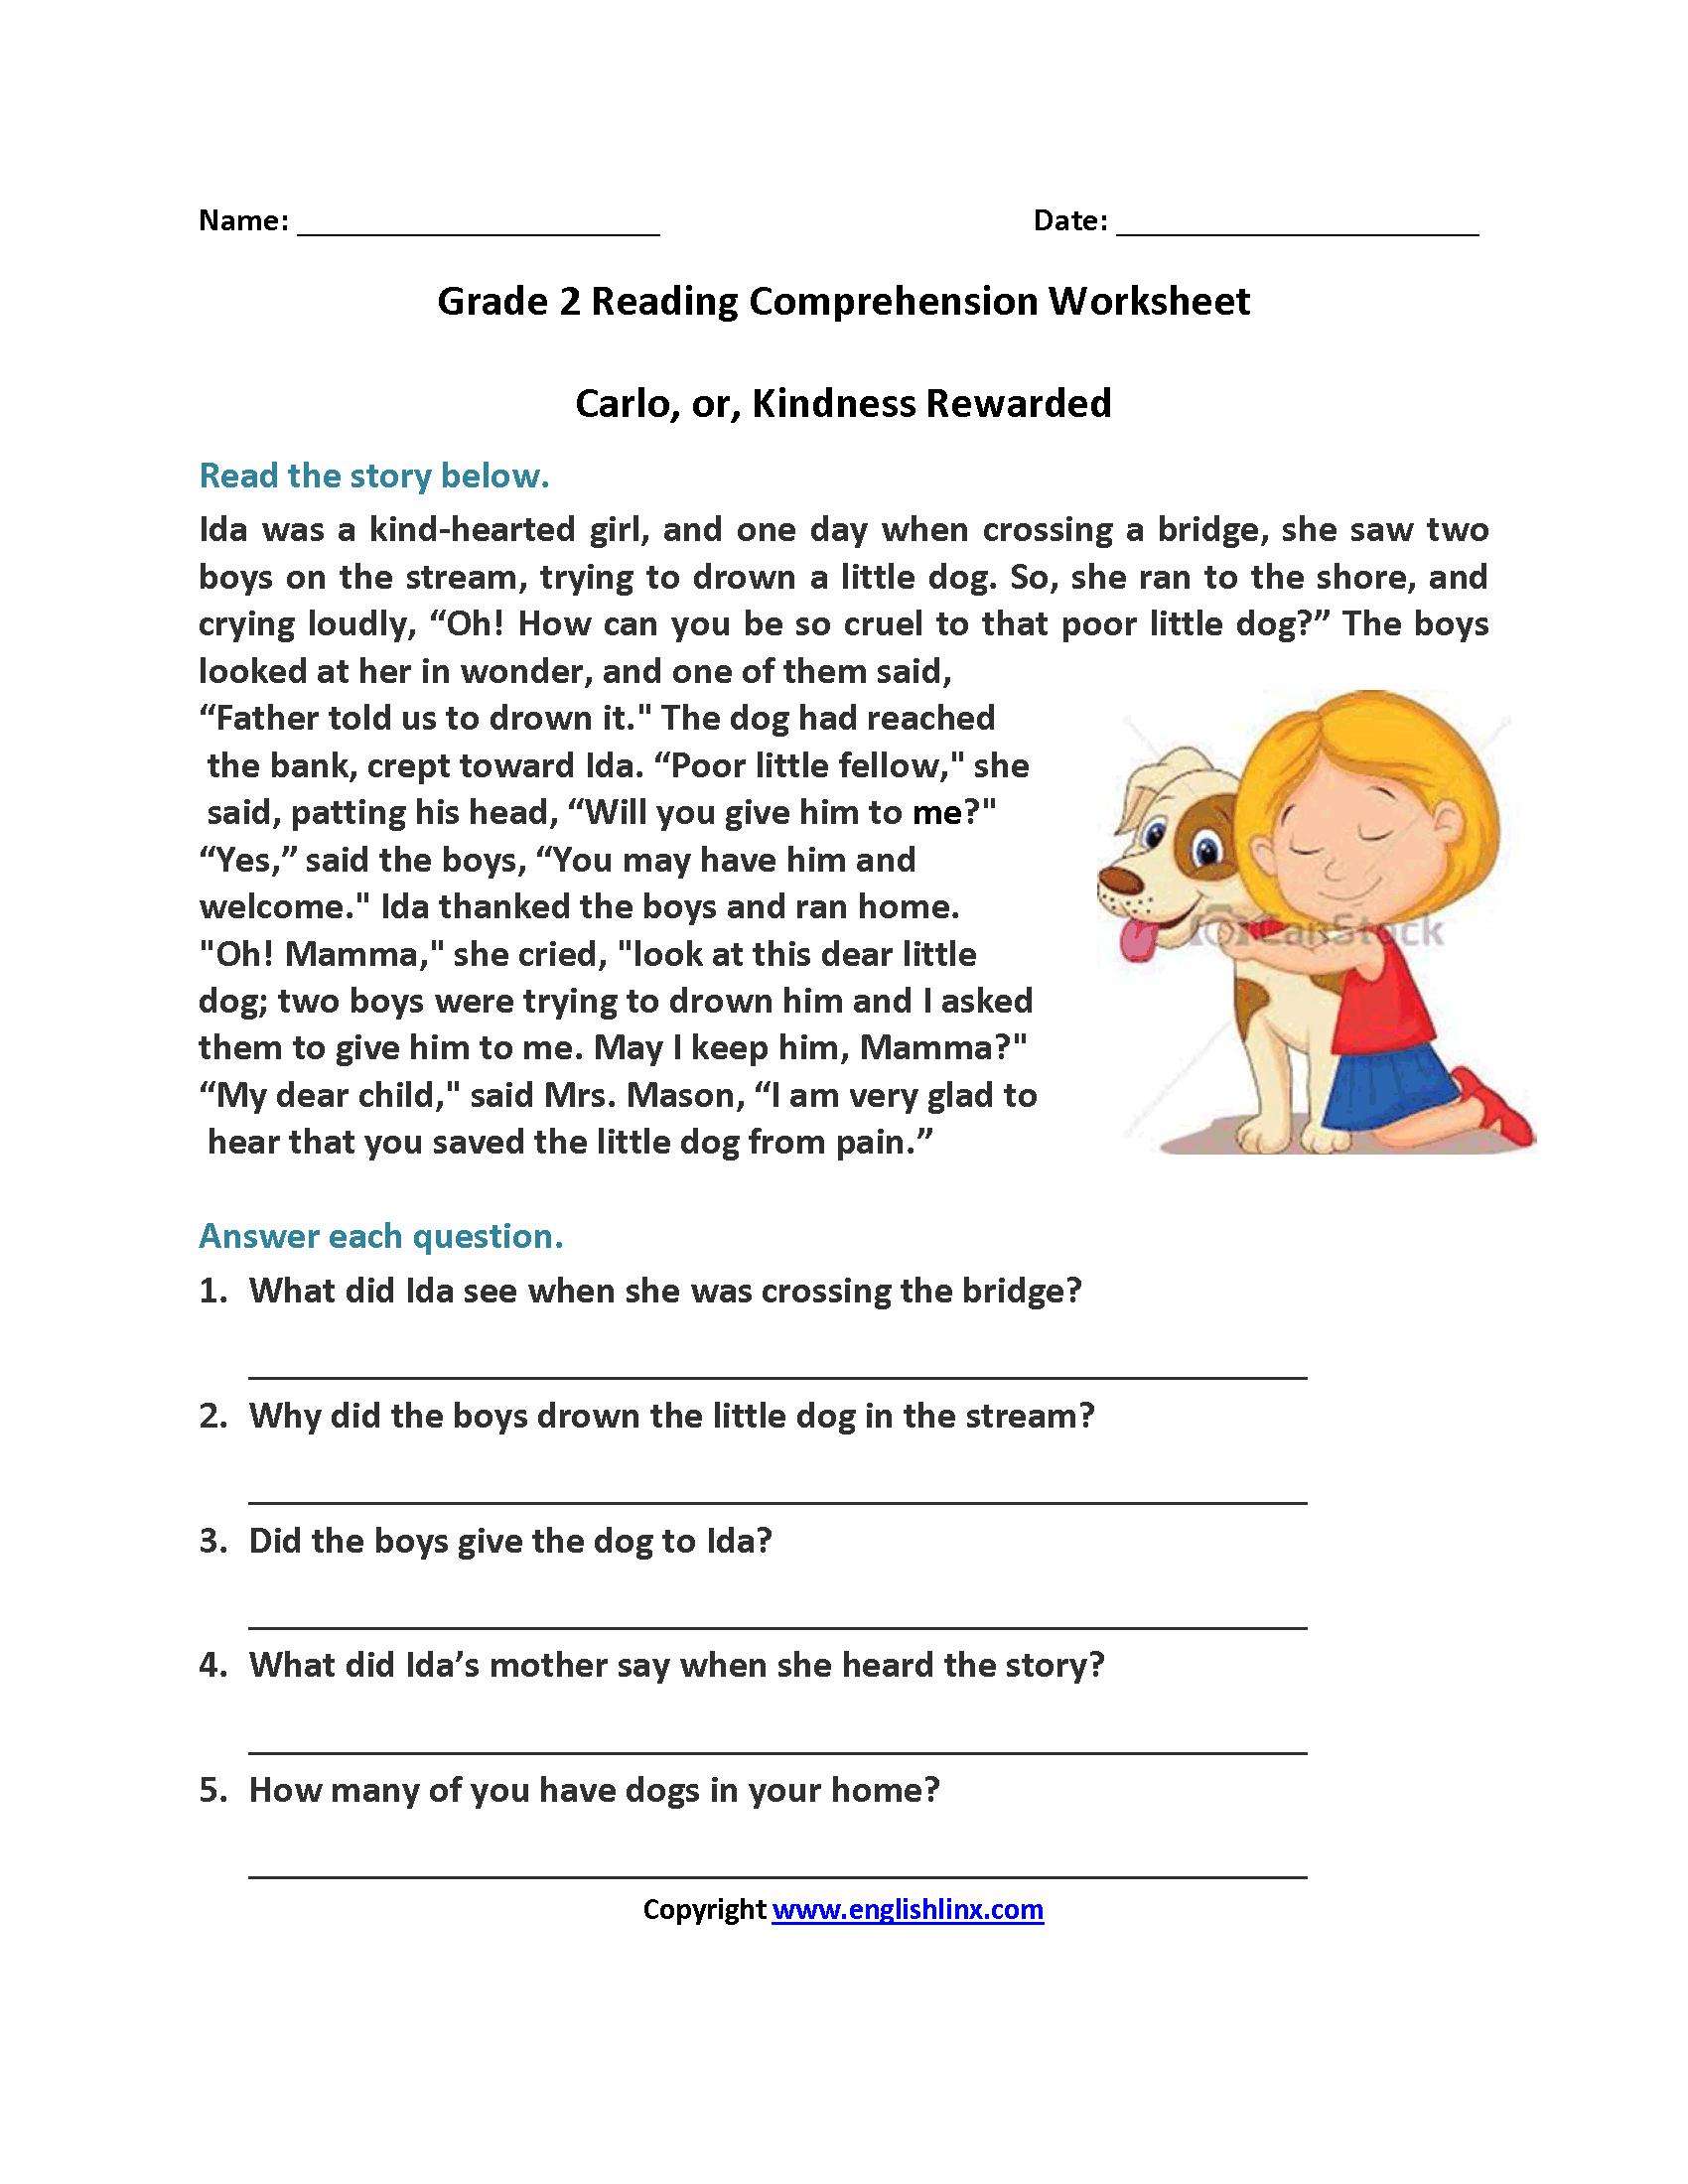 Carlo Or Kindness Rewarded Second Grade Reading Worksheets | Reading - Free Printable Comprehension Worksheets For Grade 5